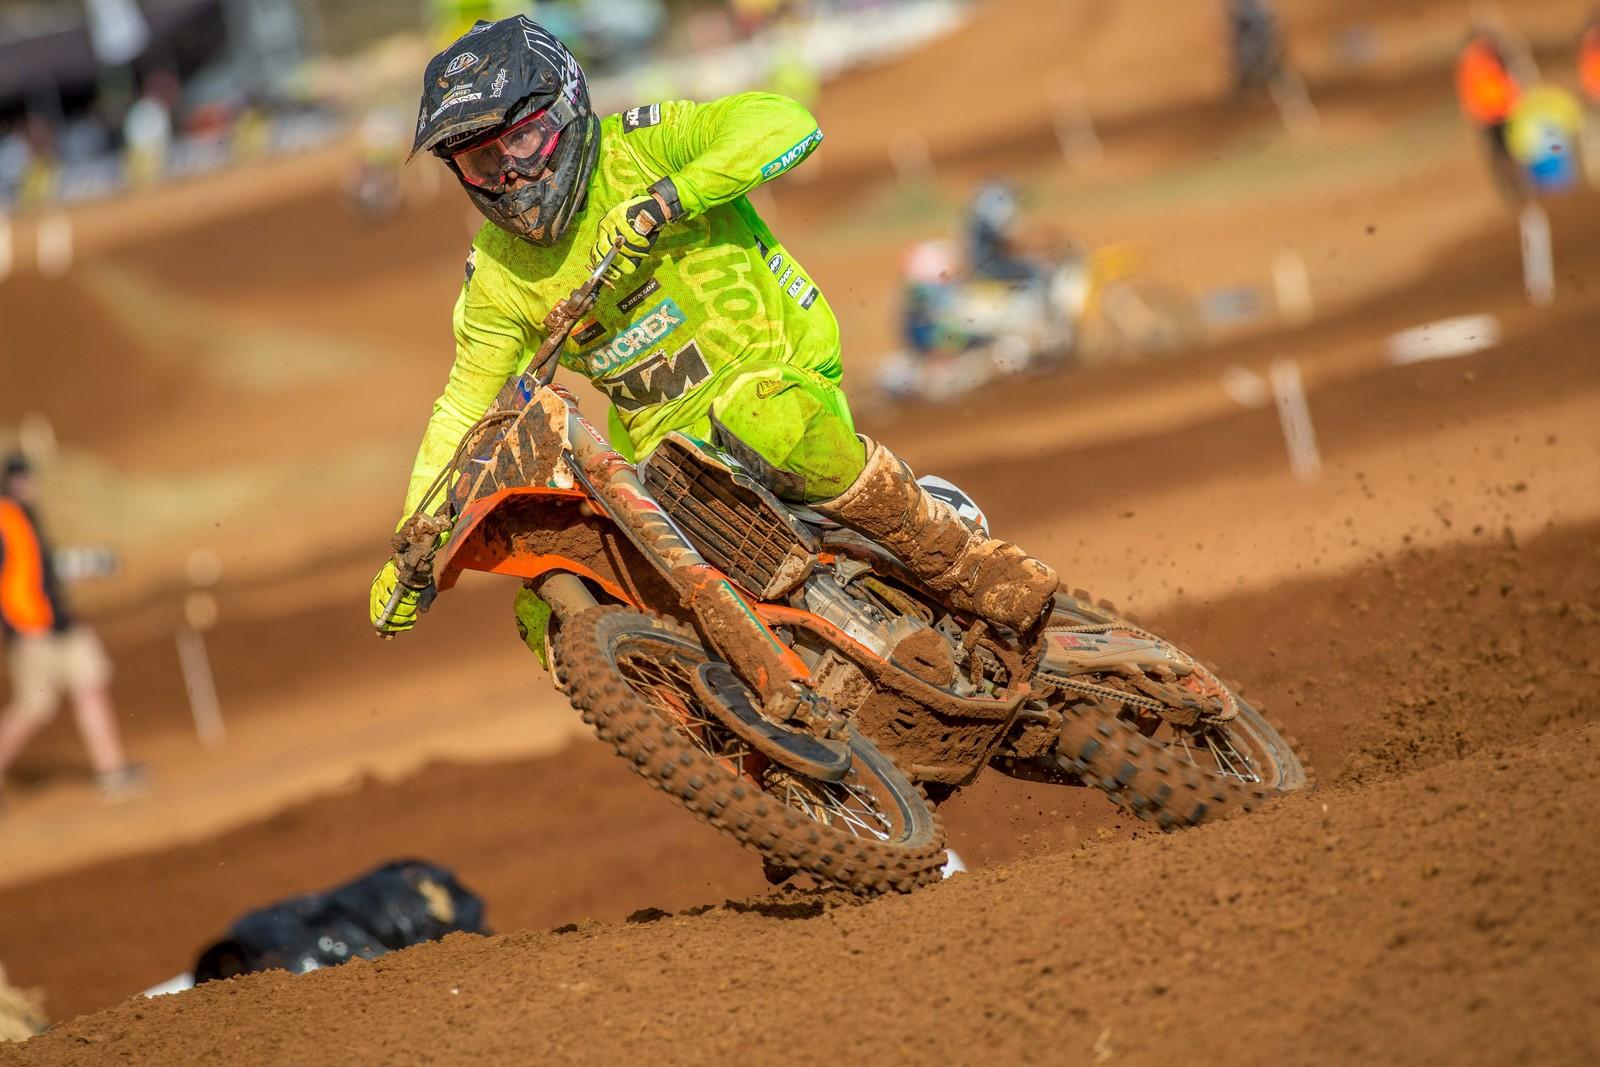 Jesse Dobson - Australian Motul Mx Championships: Round 4, Murray Bridge - Motocross Pictures - Vital MX